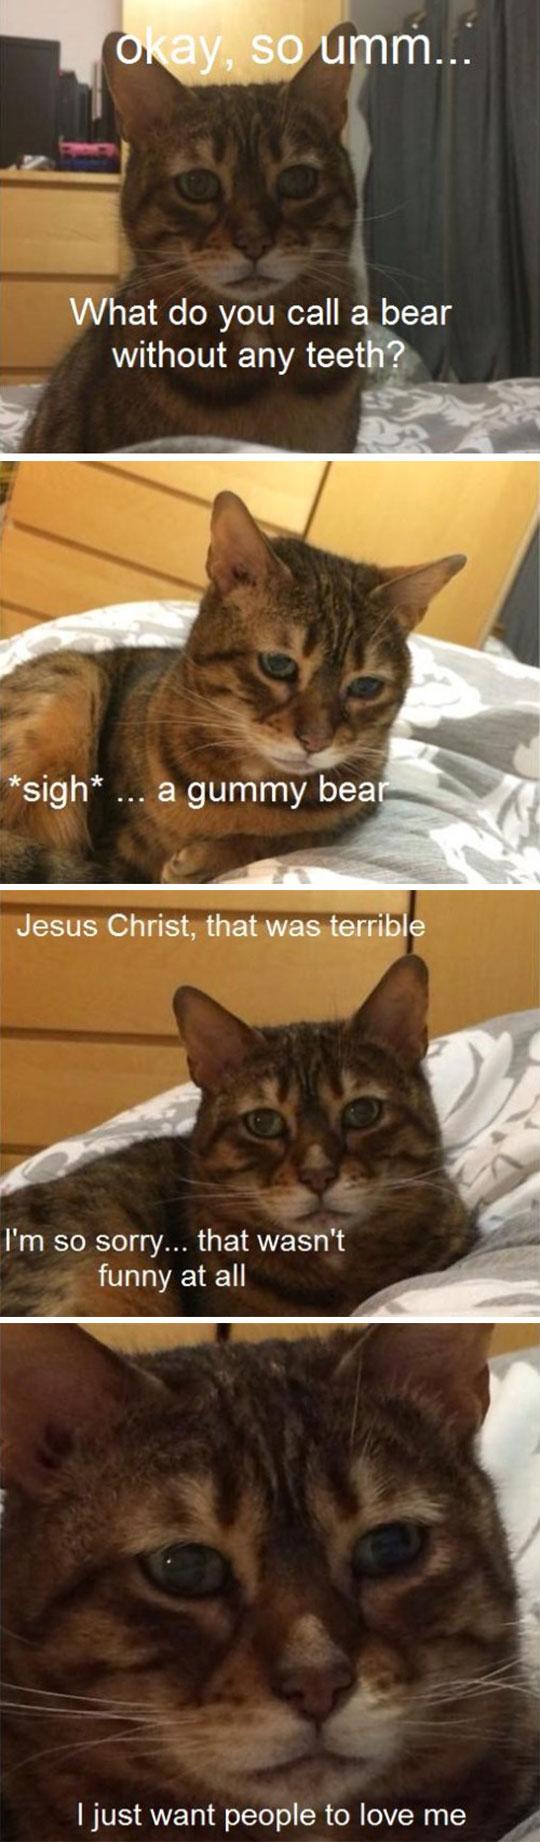 Sad Cat Tries Comedy